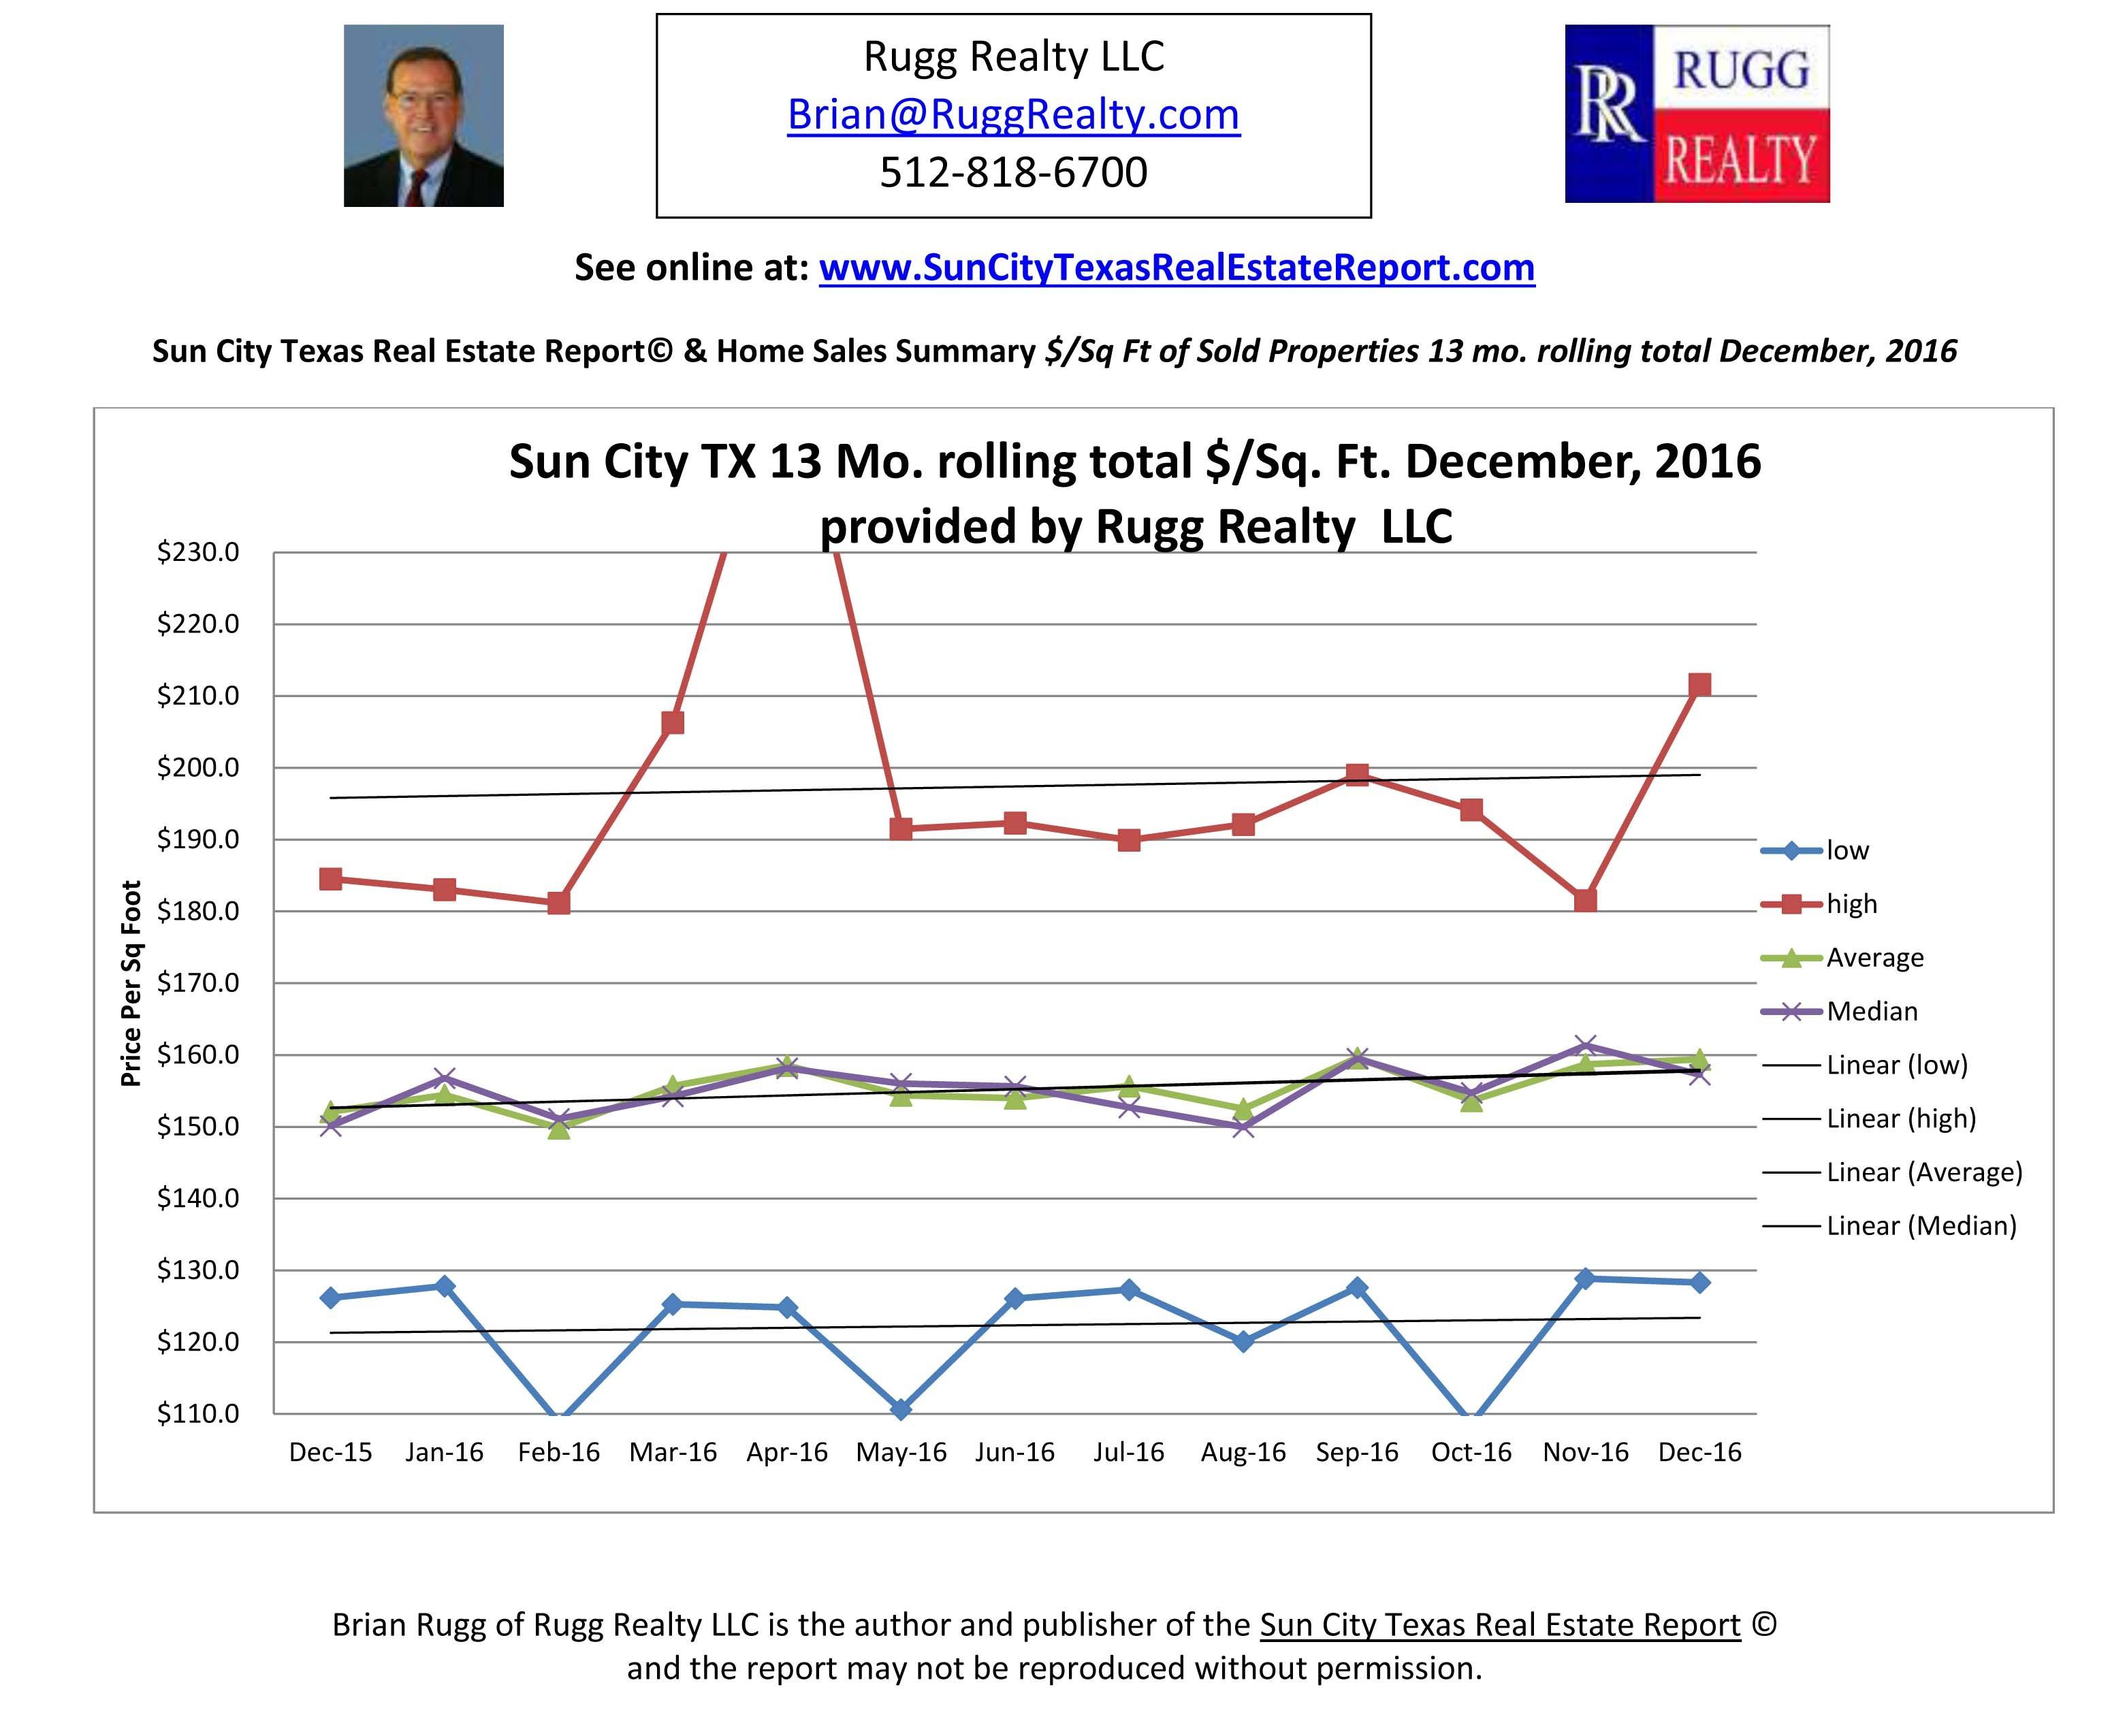 Home Sales Cost Per Square Foot Sun City Texas Rugg Realty + Bonus